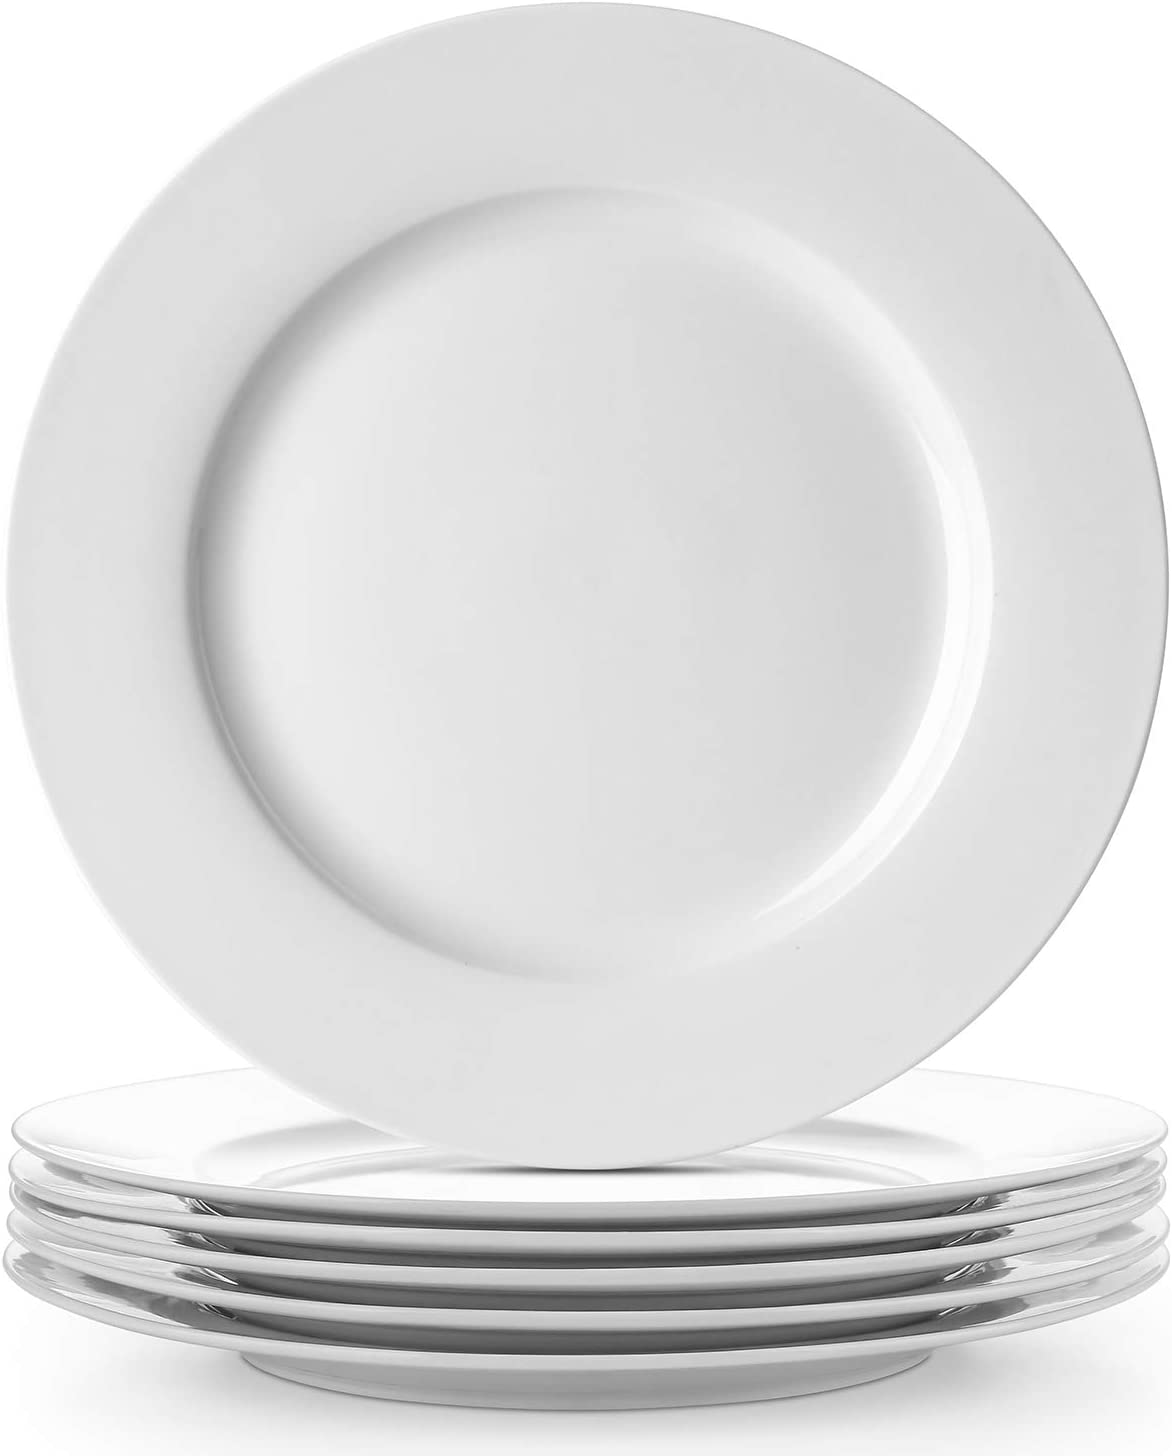 Surprise price DOWAN Porcelain White Tampa Mall Dinner Plates Set Se Salad - Round Dessert